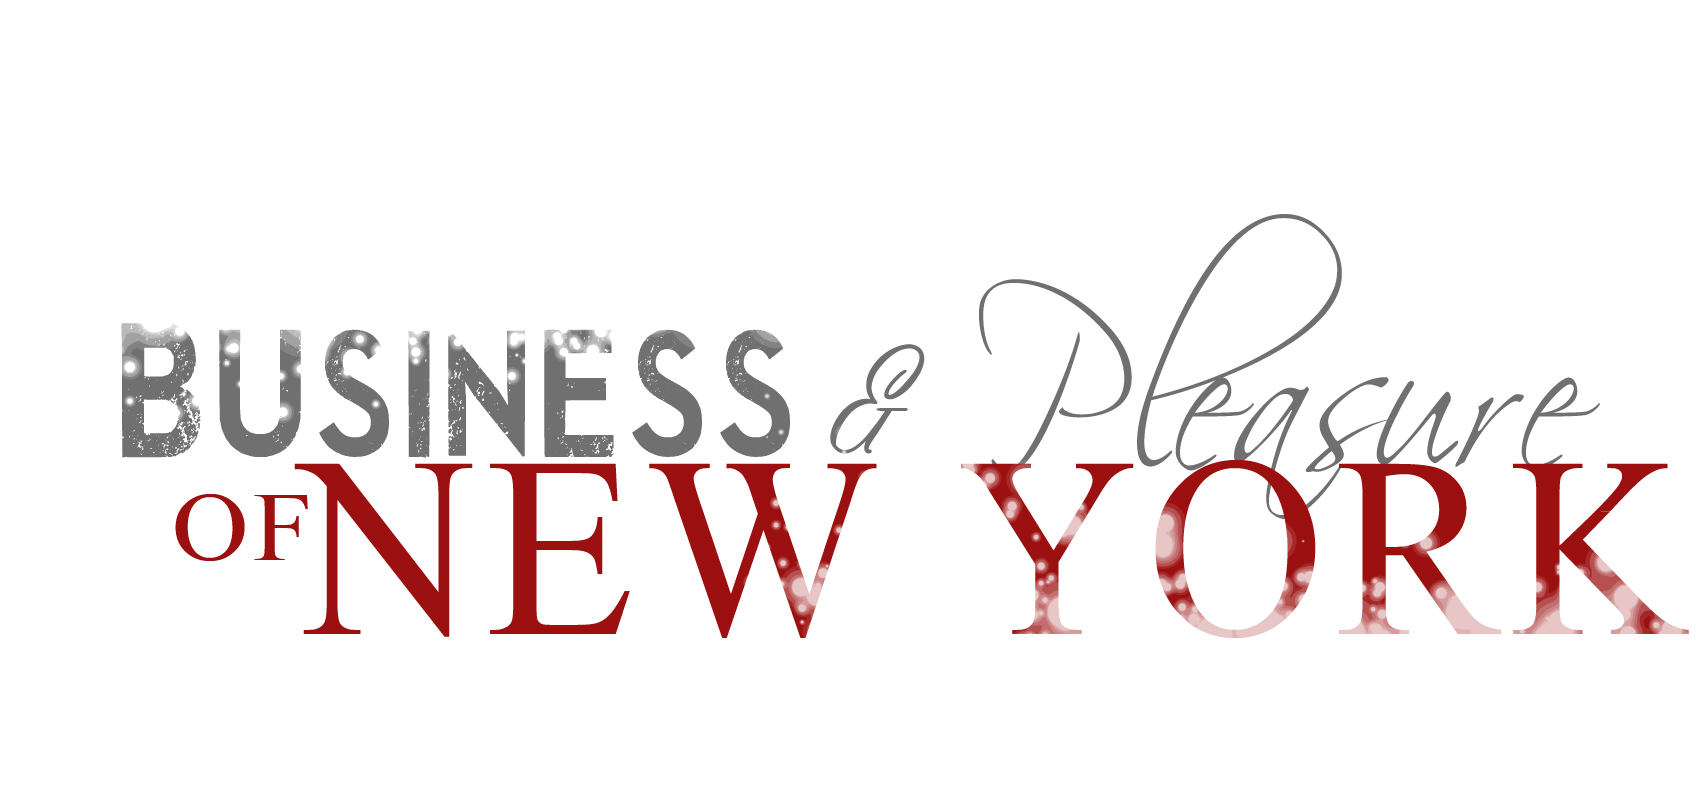 Business & Pleasure of New York!